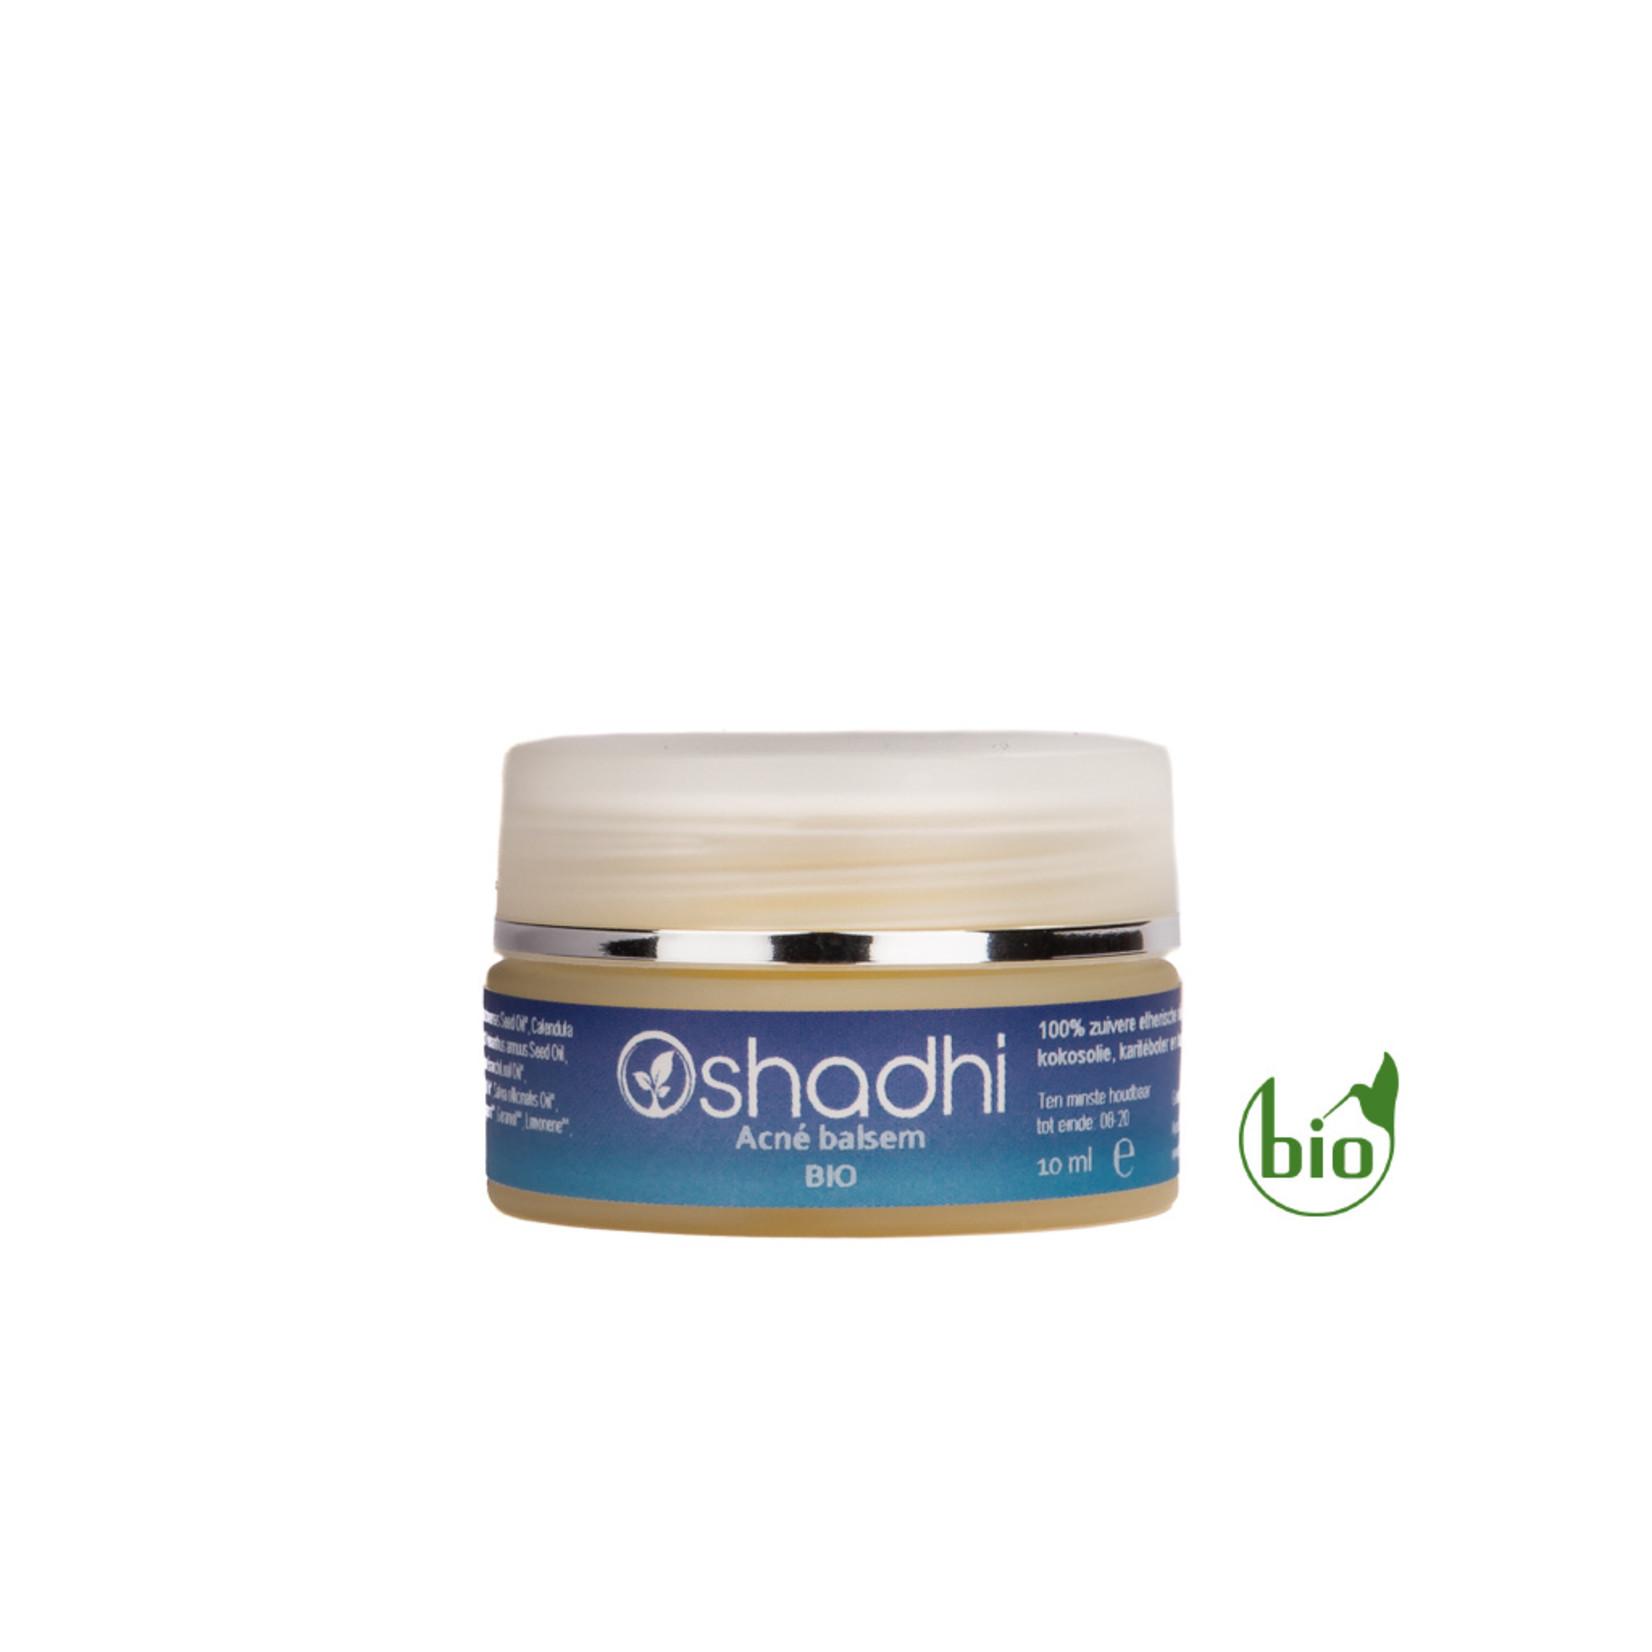 Oshadhi Acné balsem Oshadhi - vermindert acne en verzacht ontstoken huid - 10ml